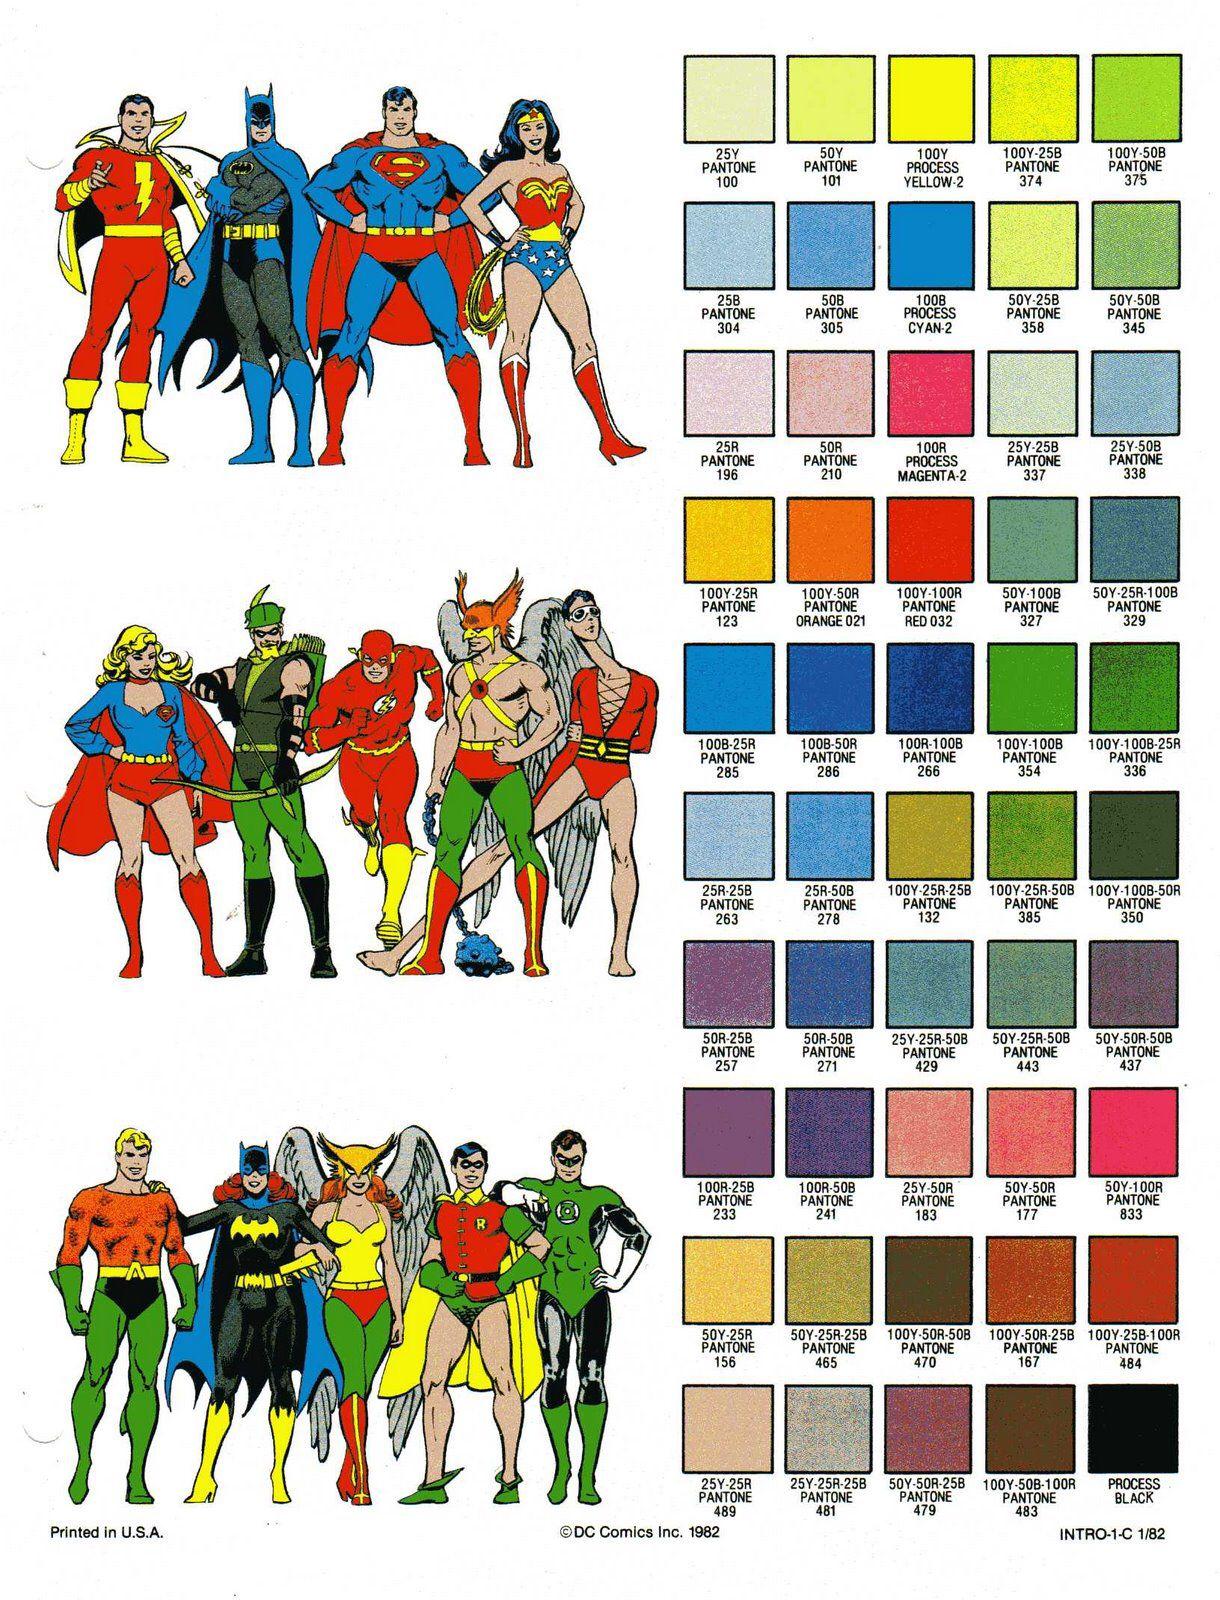 Book color palette - Color Swatches